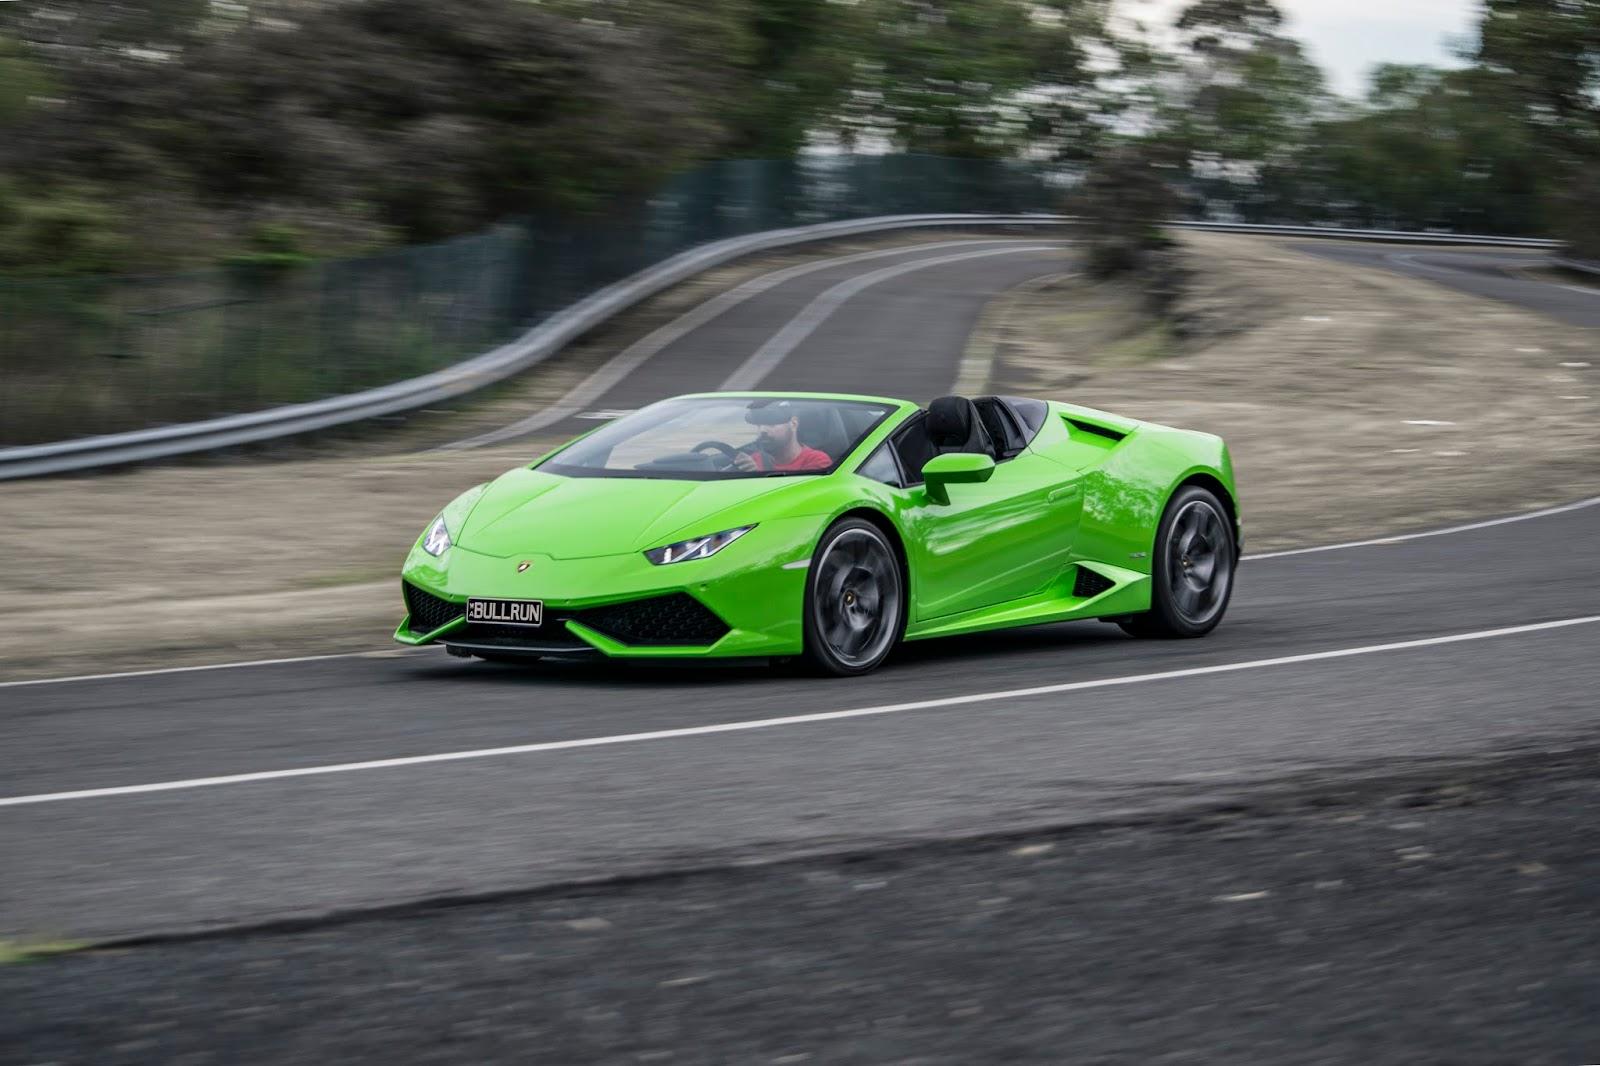 Lamborghini Huracan LP610-4 Spyder 2016